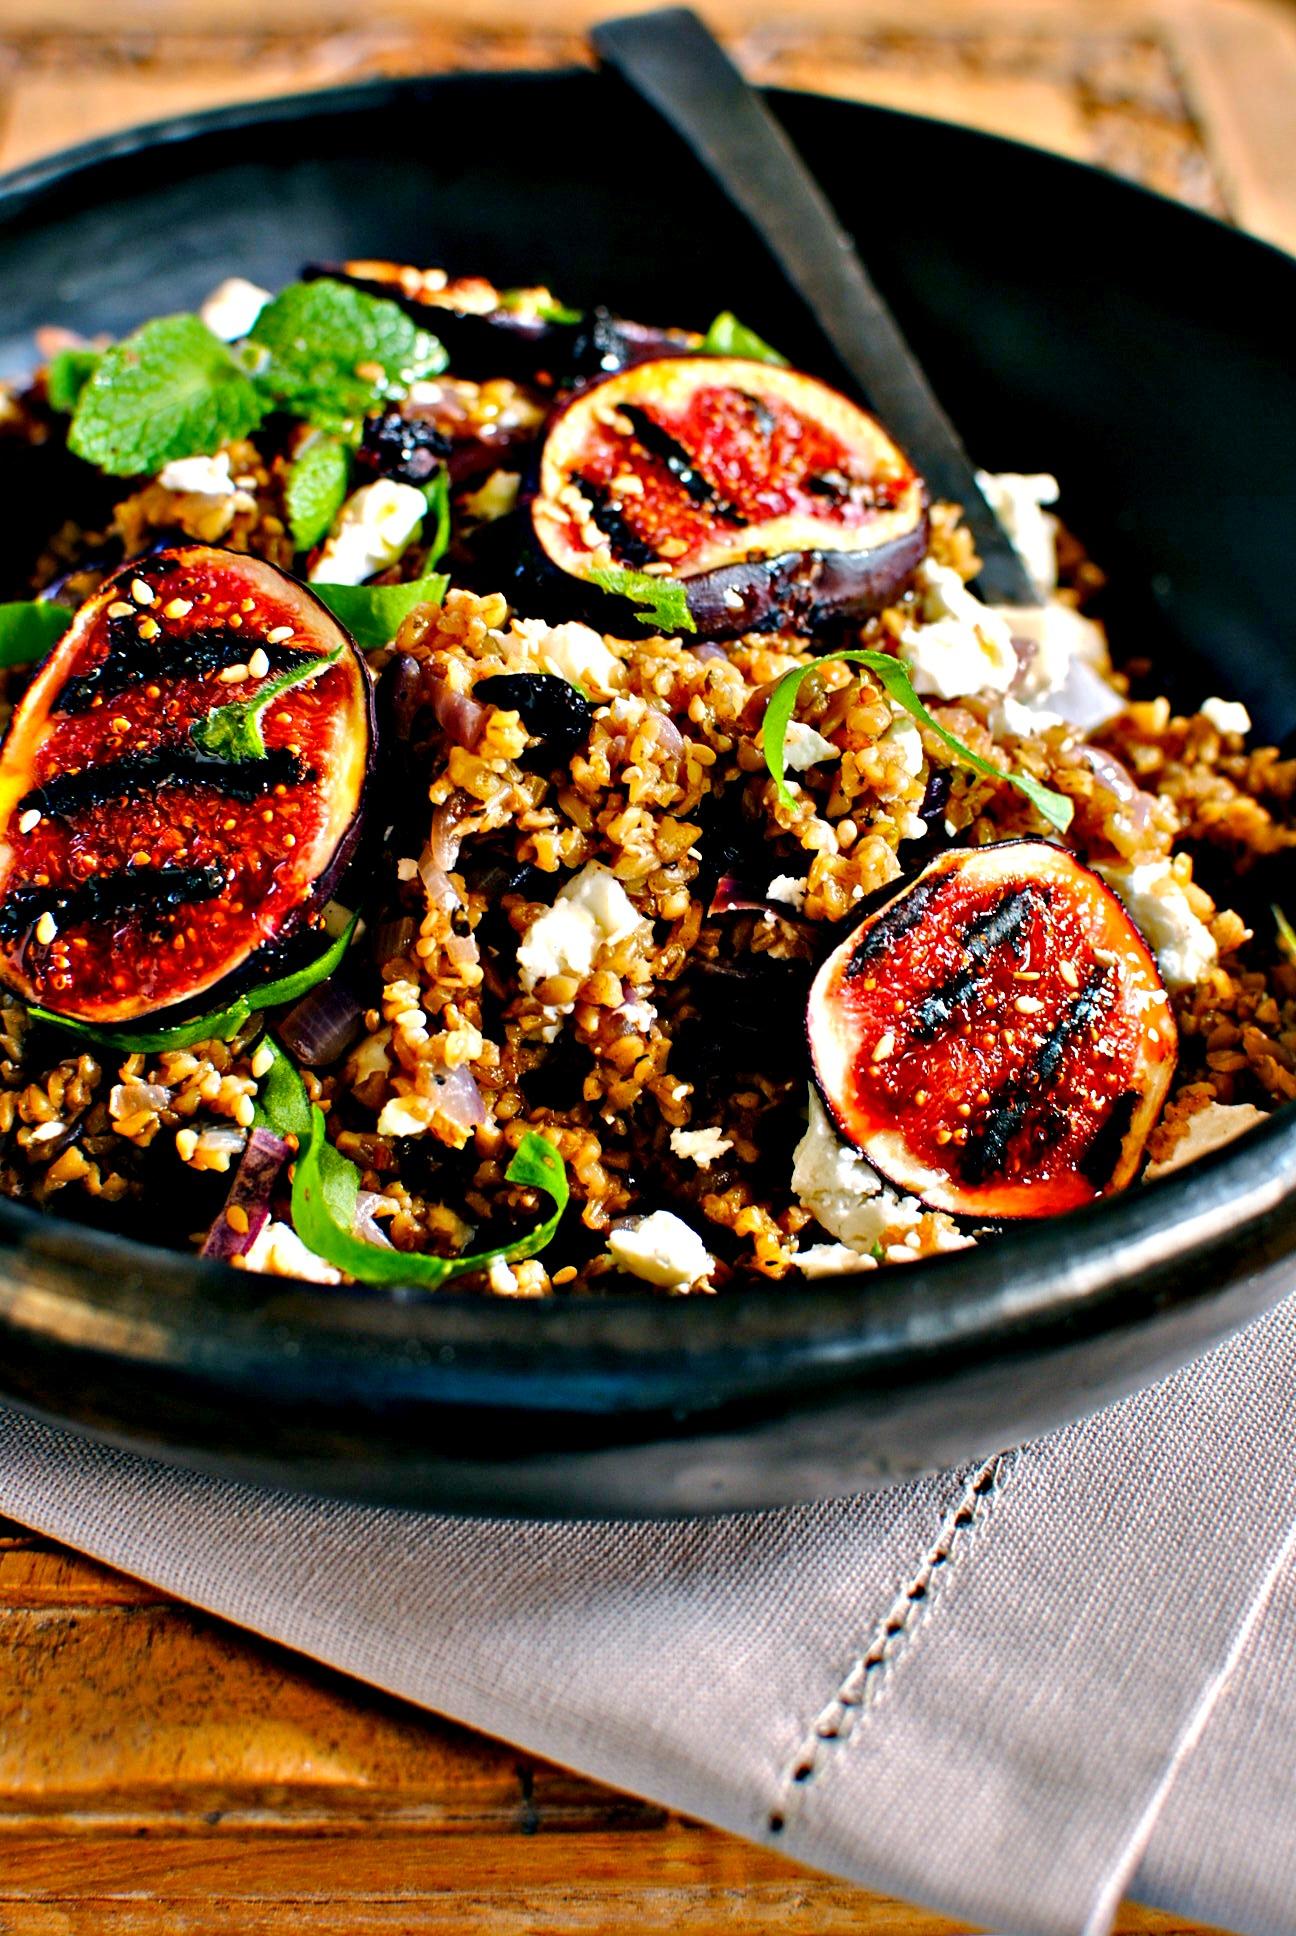 Lebanese freekeh and fig salad freekehing fabulous food to glow lebanese freekeh and fig salad forumfinder Choice Image